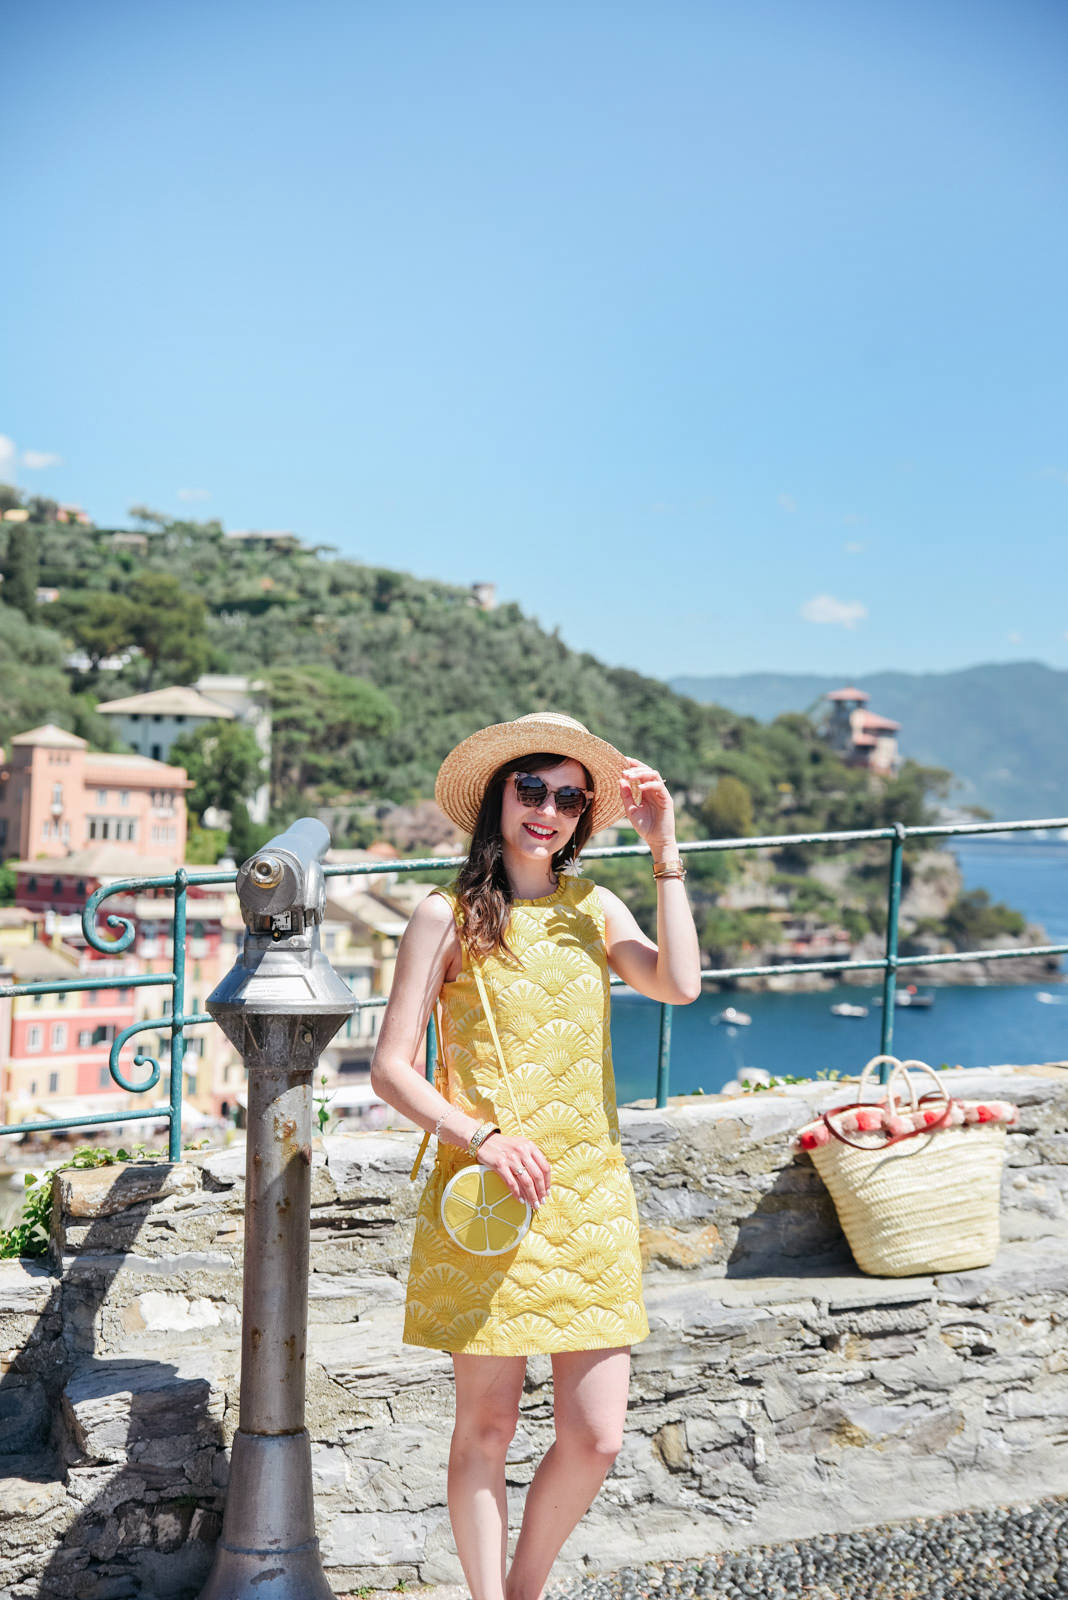 Blog-Mode-And-The-City-Lifestyle-Italie-Portofino-Belmond-Hotel-12